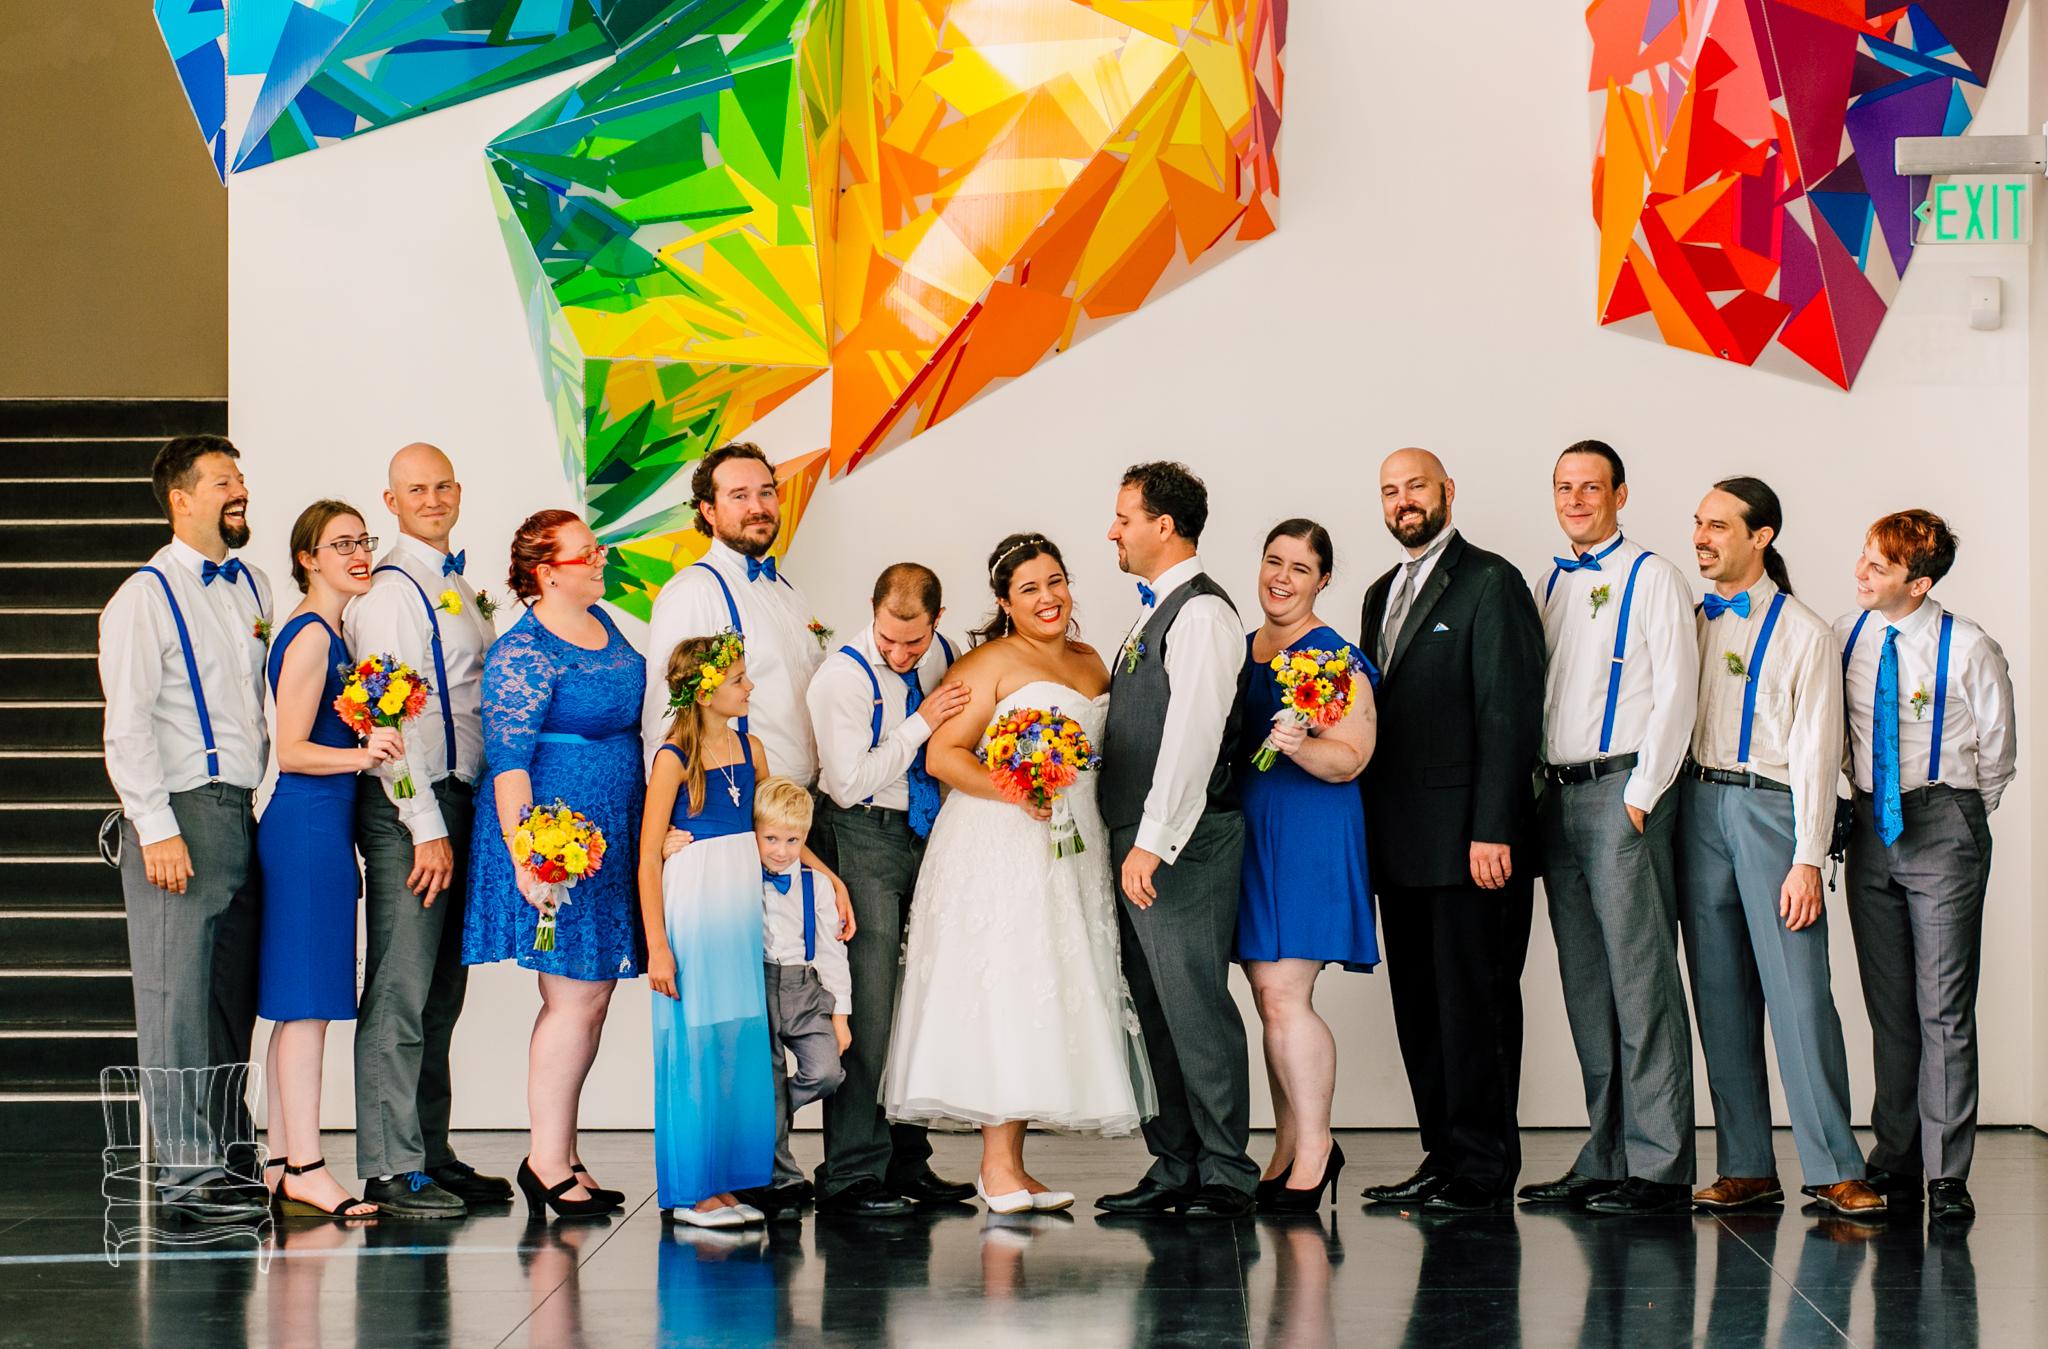 bellingham-whatcom-museum-wedding-katheryn-moran-photography-bribran-20.jpg